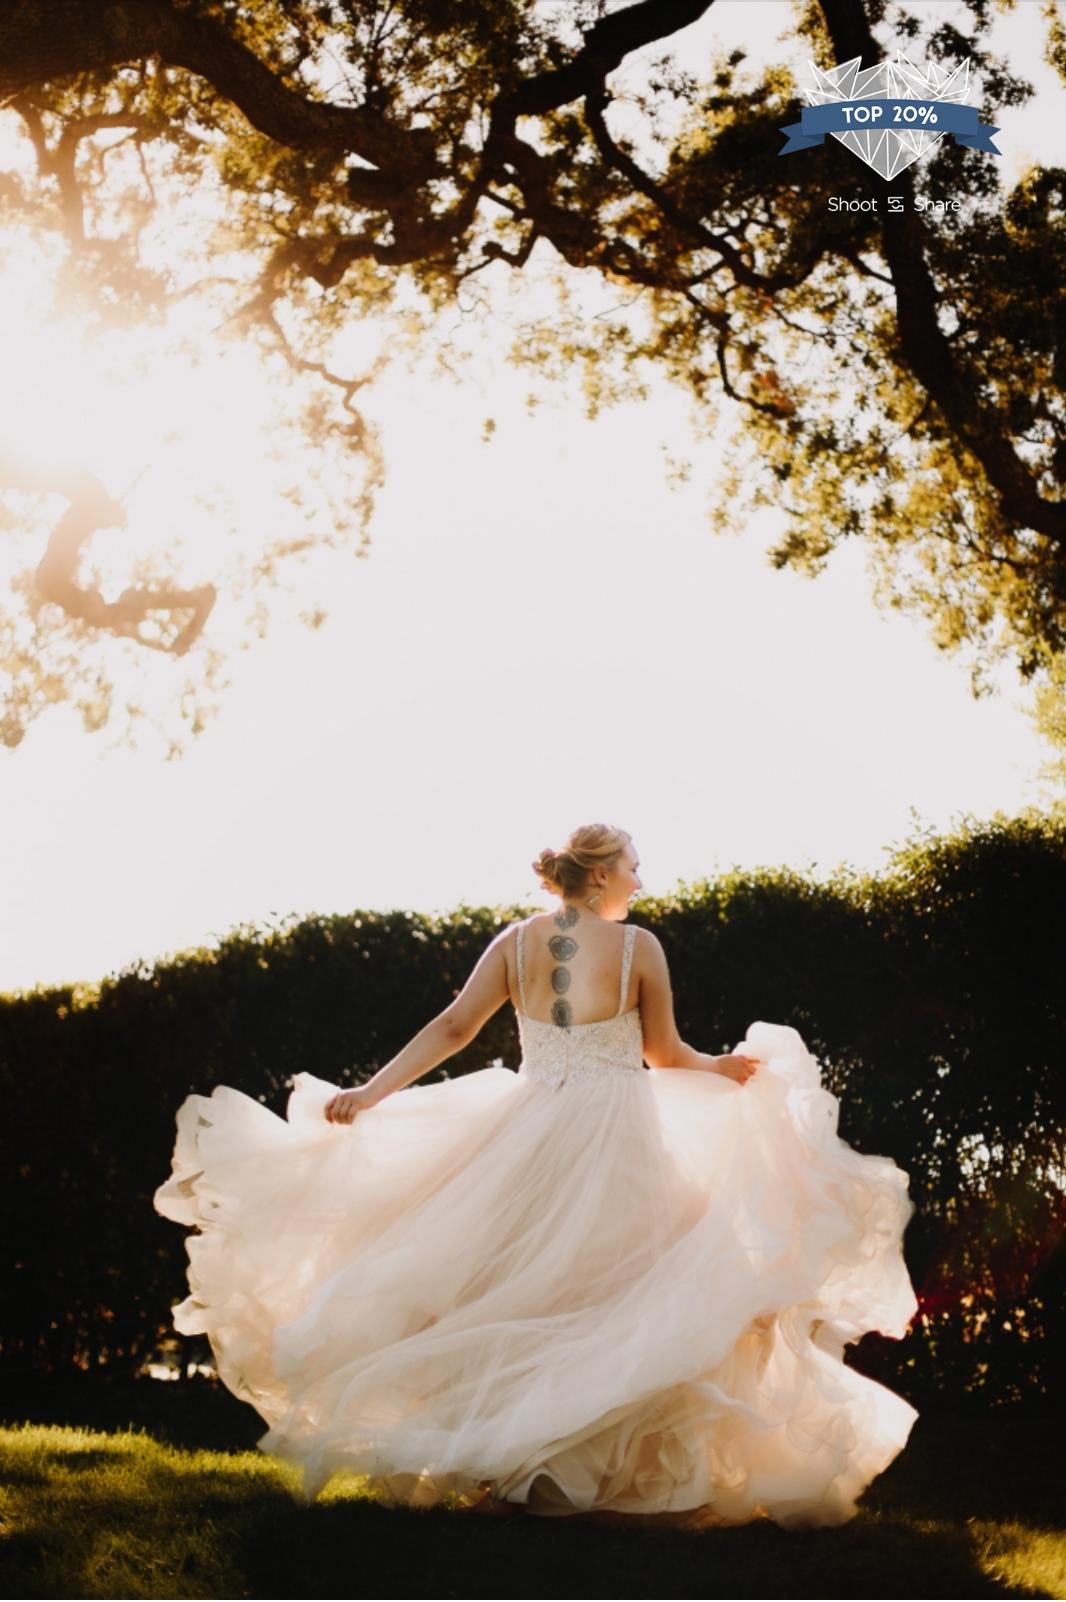 Archer Inspired Photography Shoot and Share Family Wedding Lifestyle Photographer Morgan Hill California San Francisco Bay Area-21.jpg